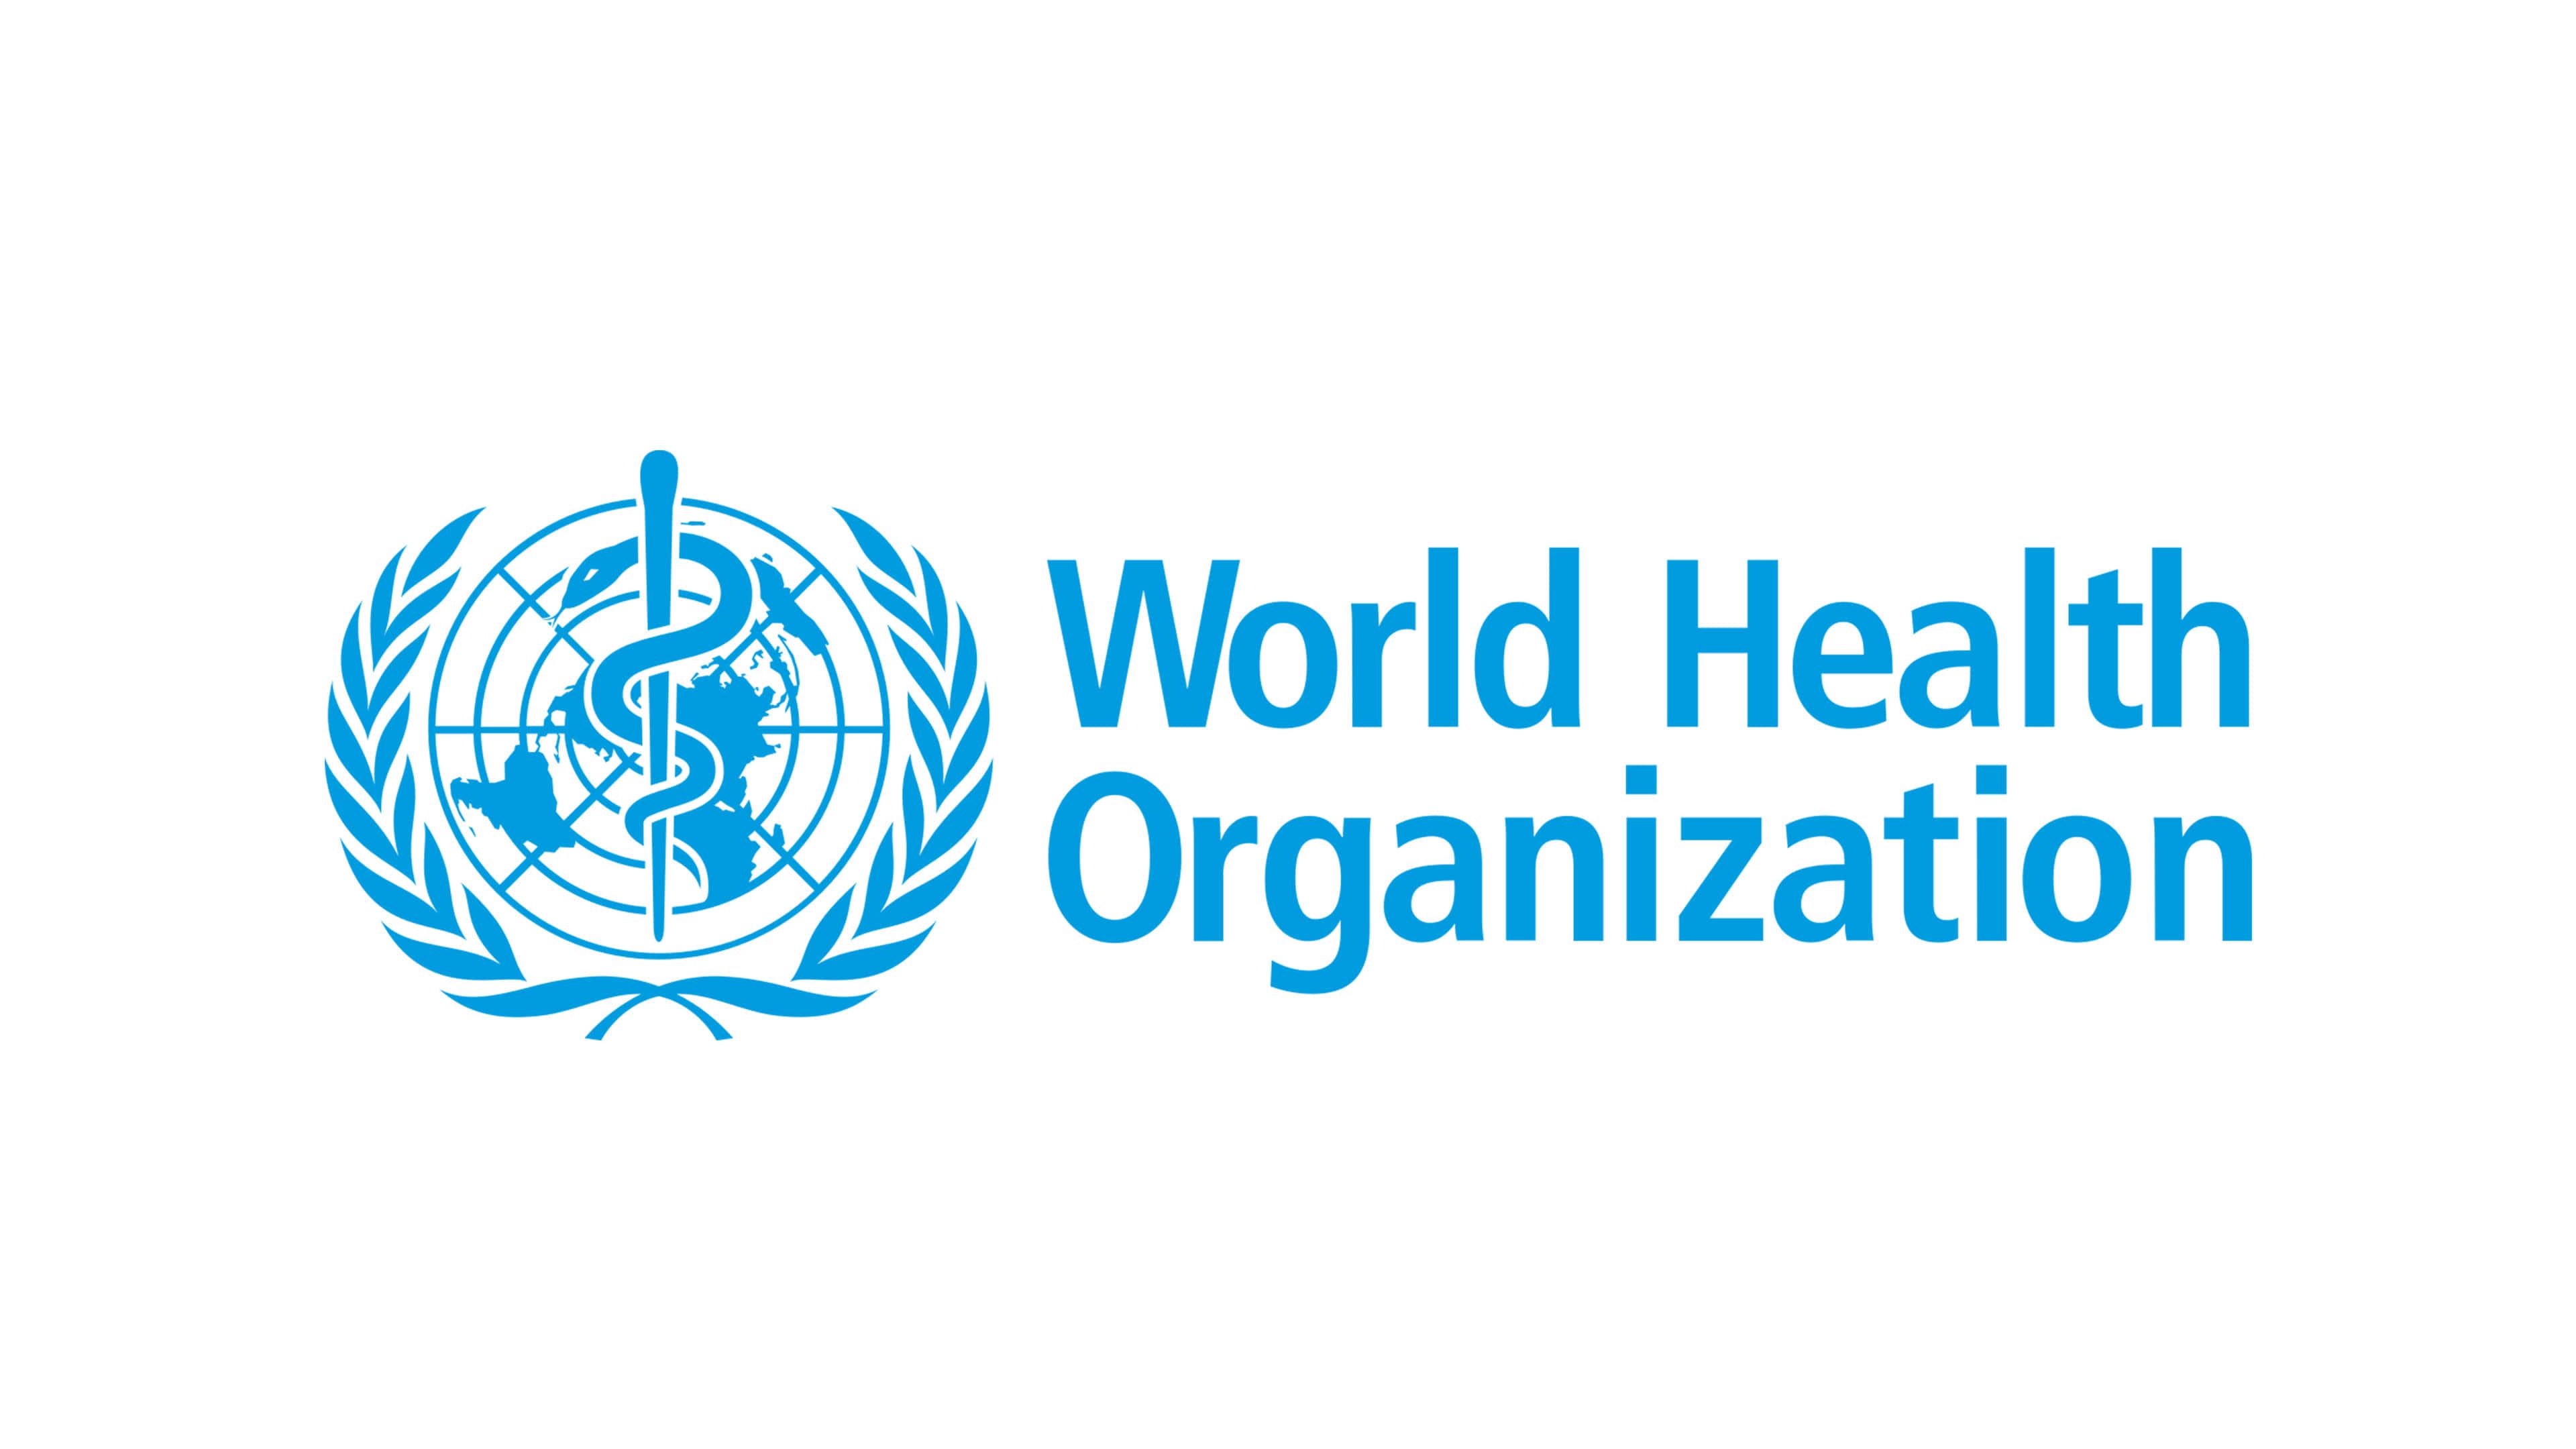 world health organization who logo uhd 4k wallpaper